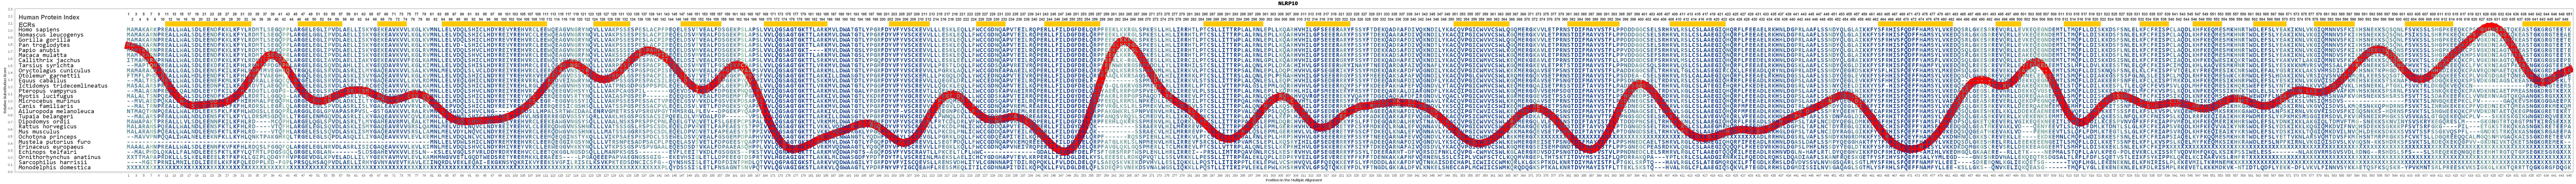 NLRP10 Gene - GeneCards | NAL10 Protein | NAL10 Antibody